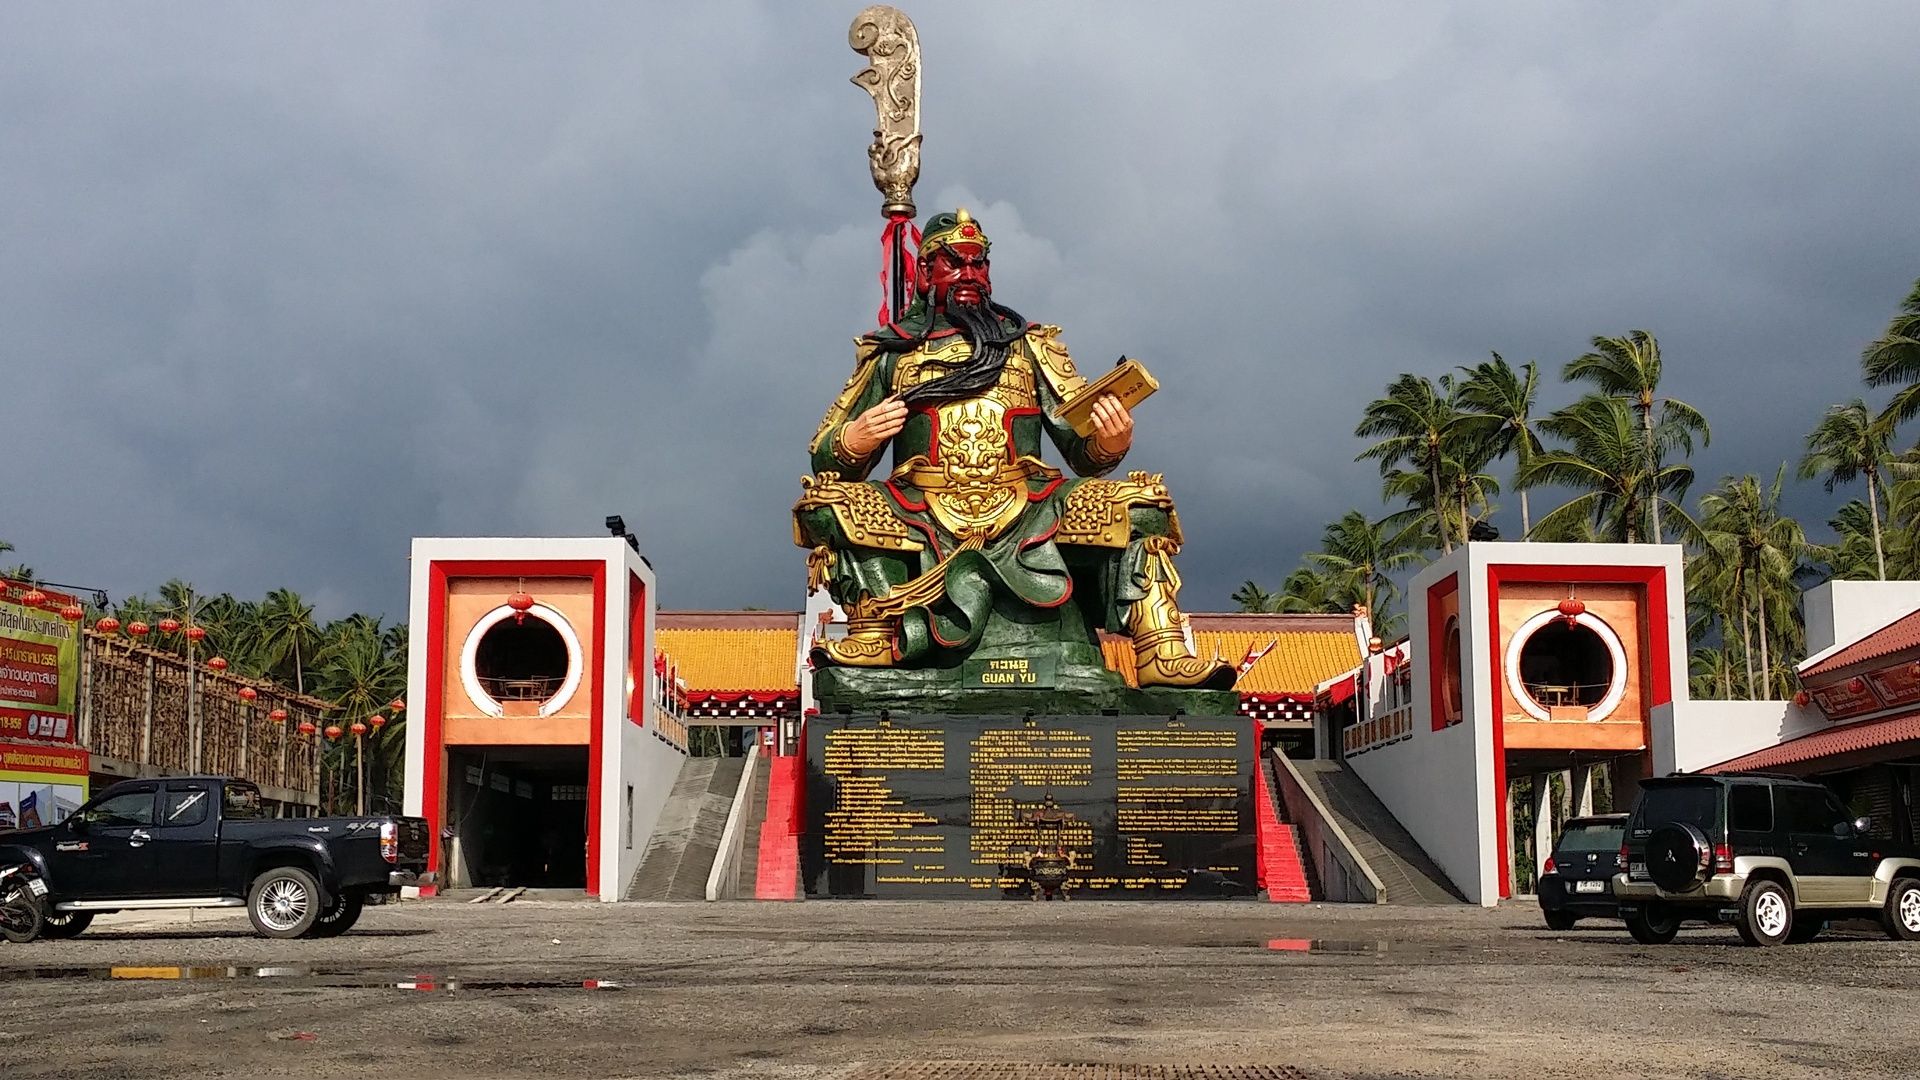 That's A Guan Yu Statue